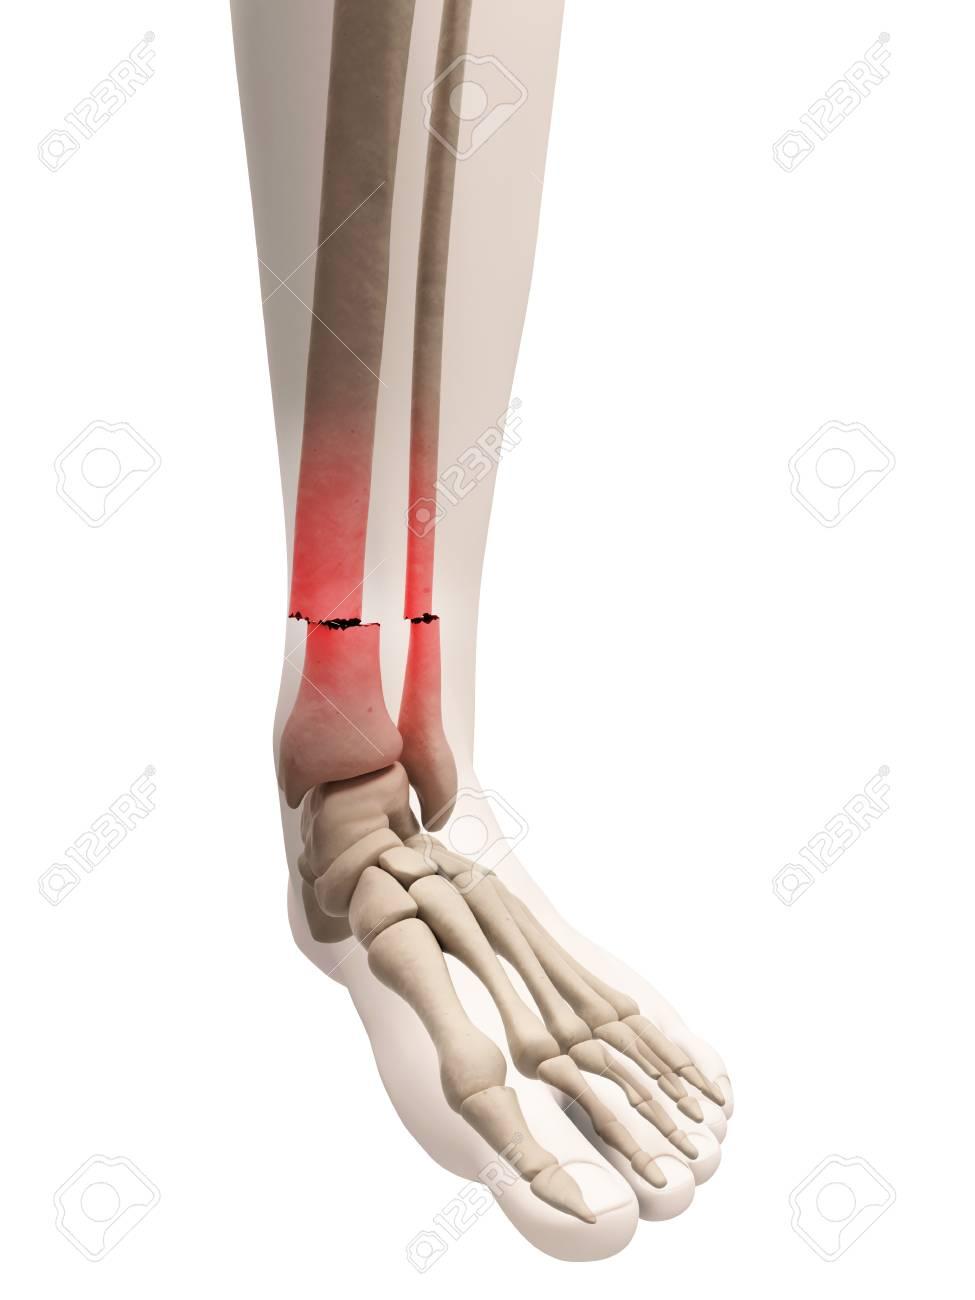 Broken Lower Leg Bones Illustration Stock Photo Picture And